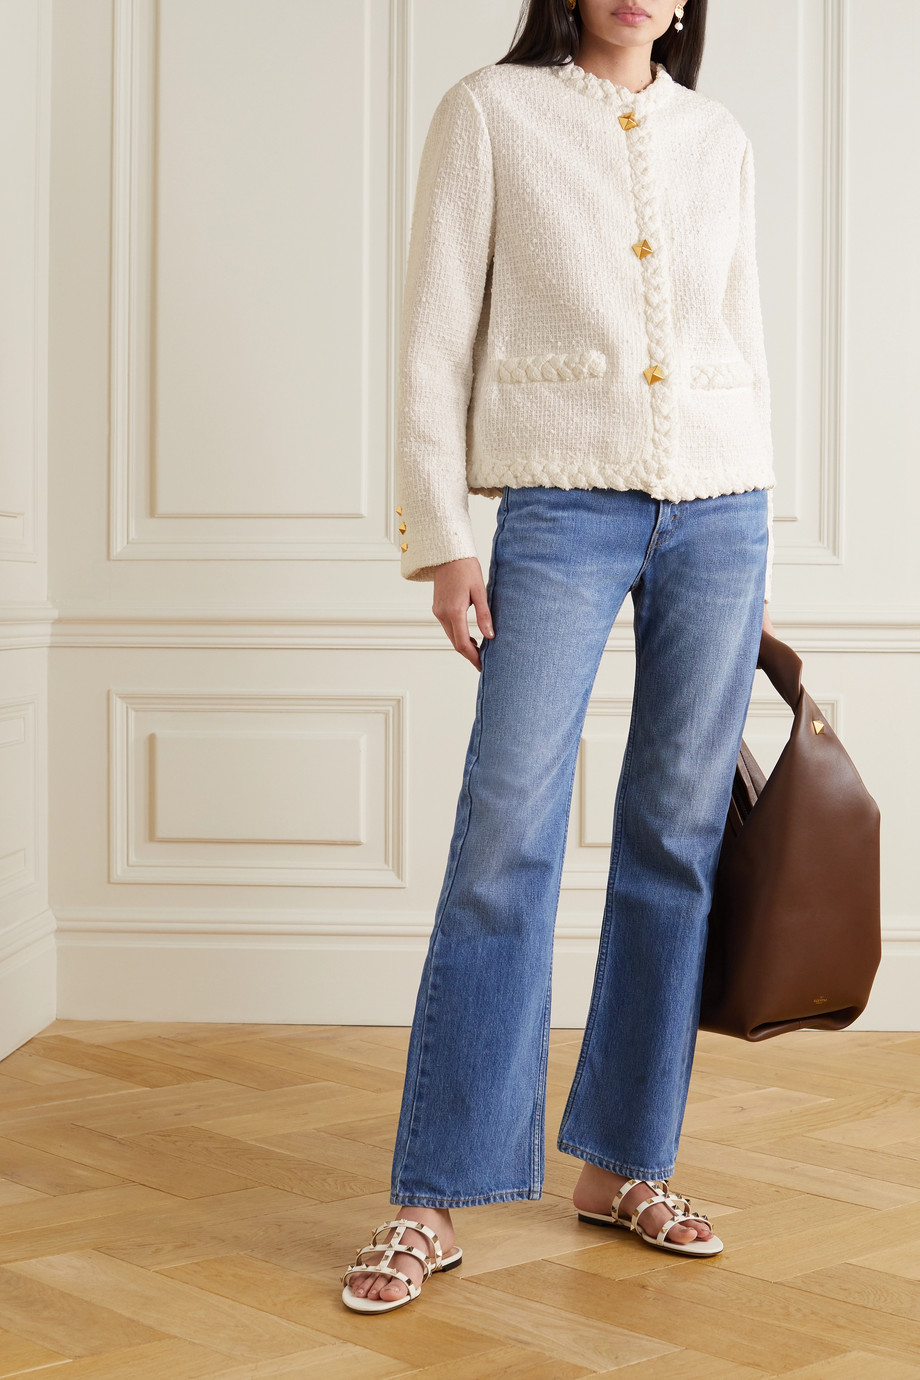 Valentino Veste en tweed bouclé de coton mélangé